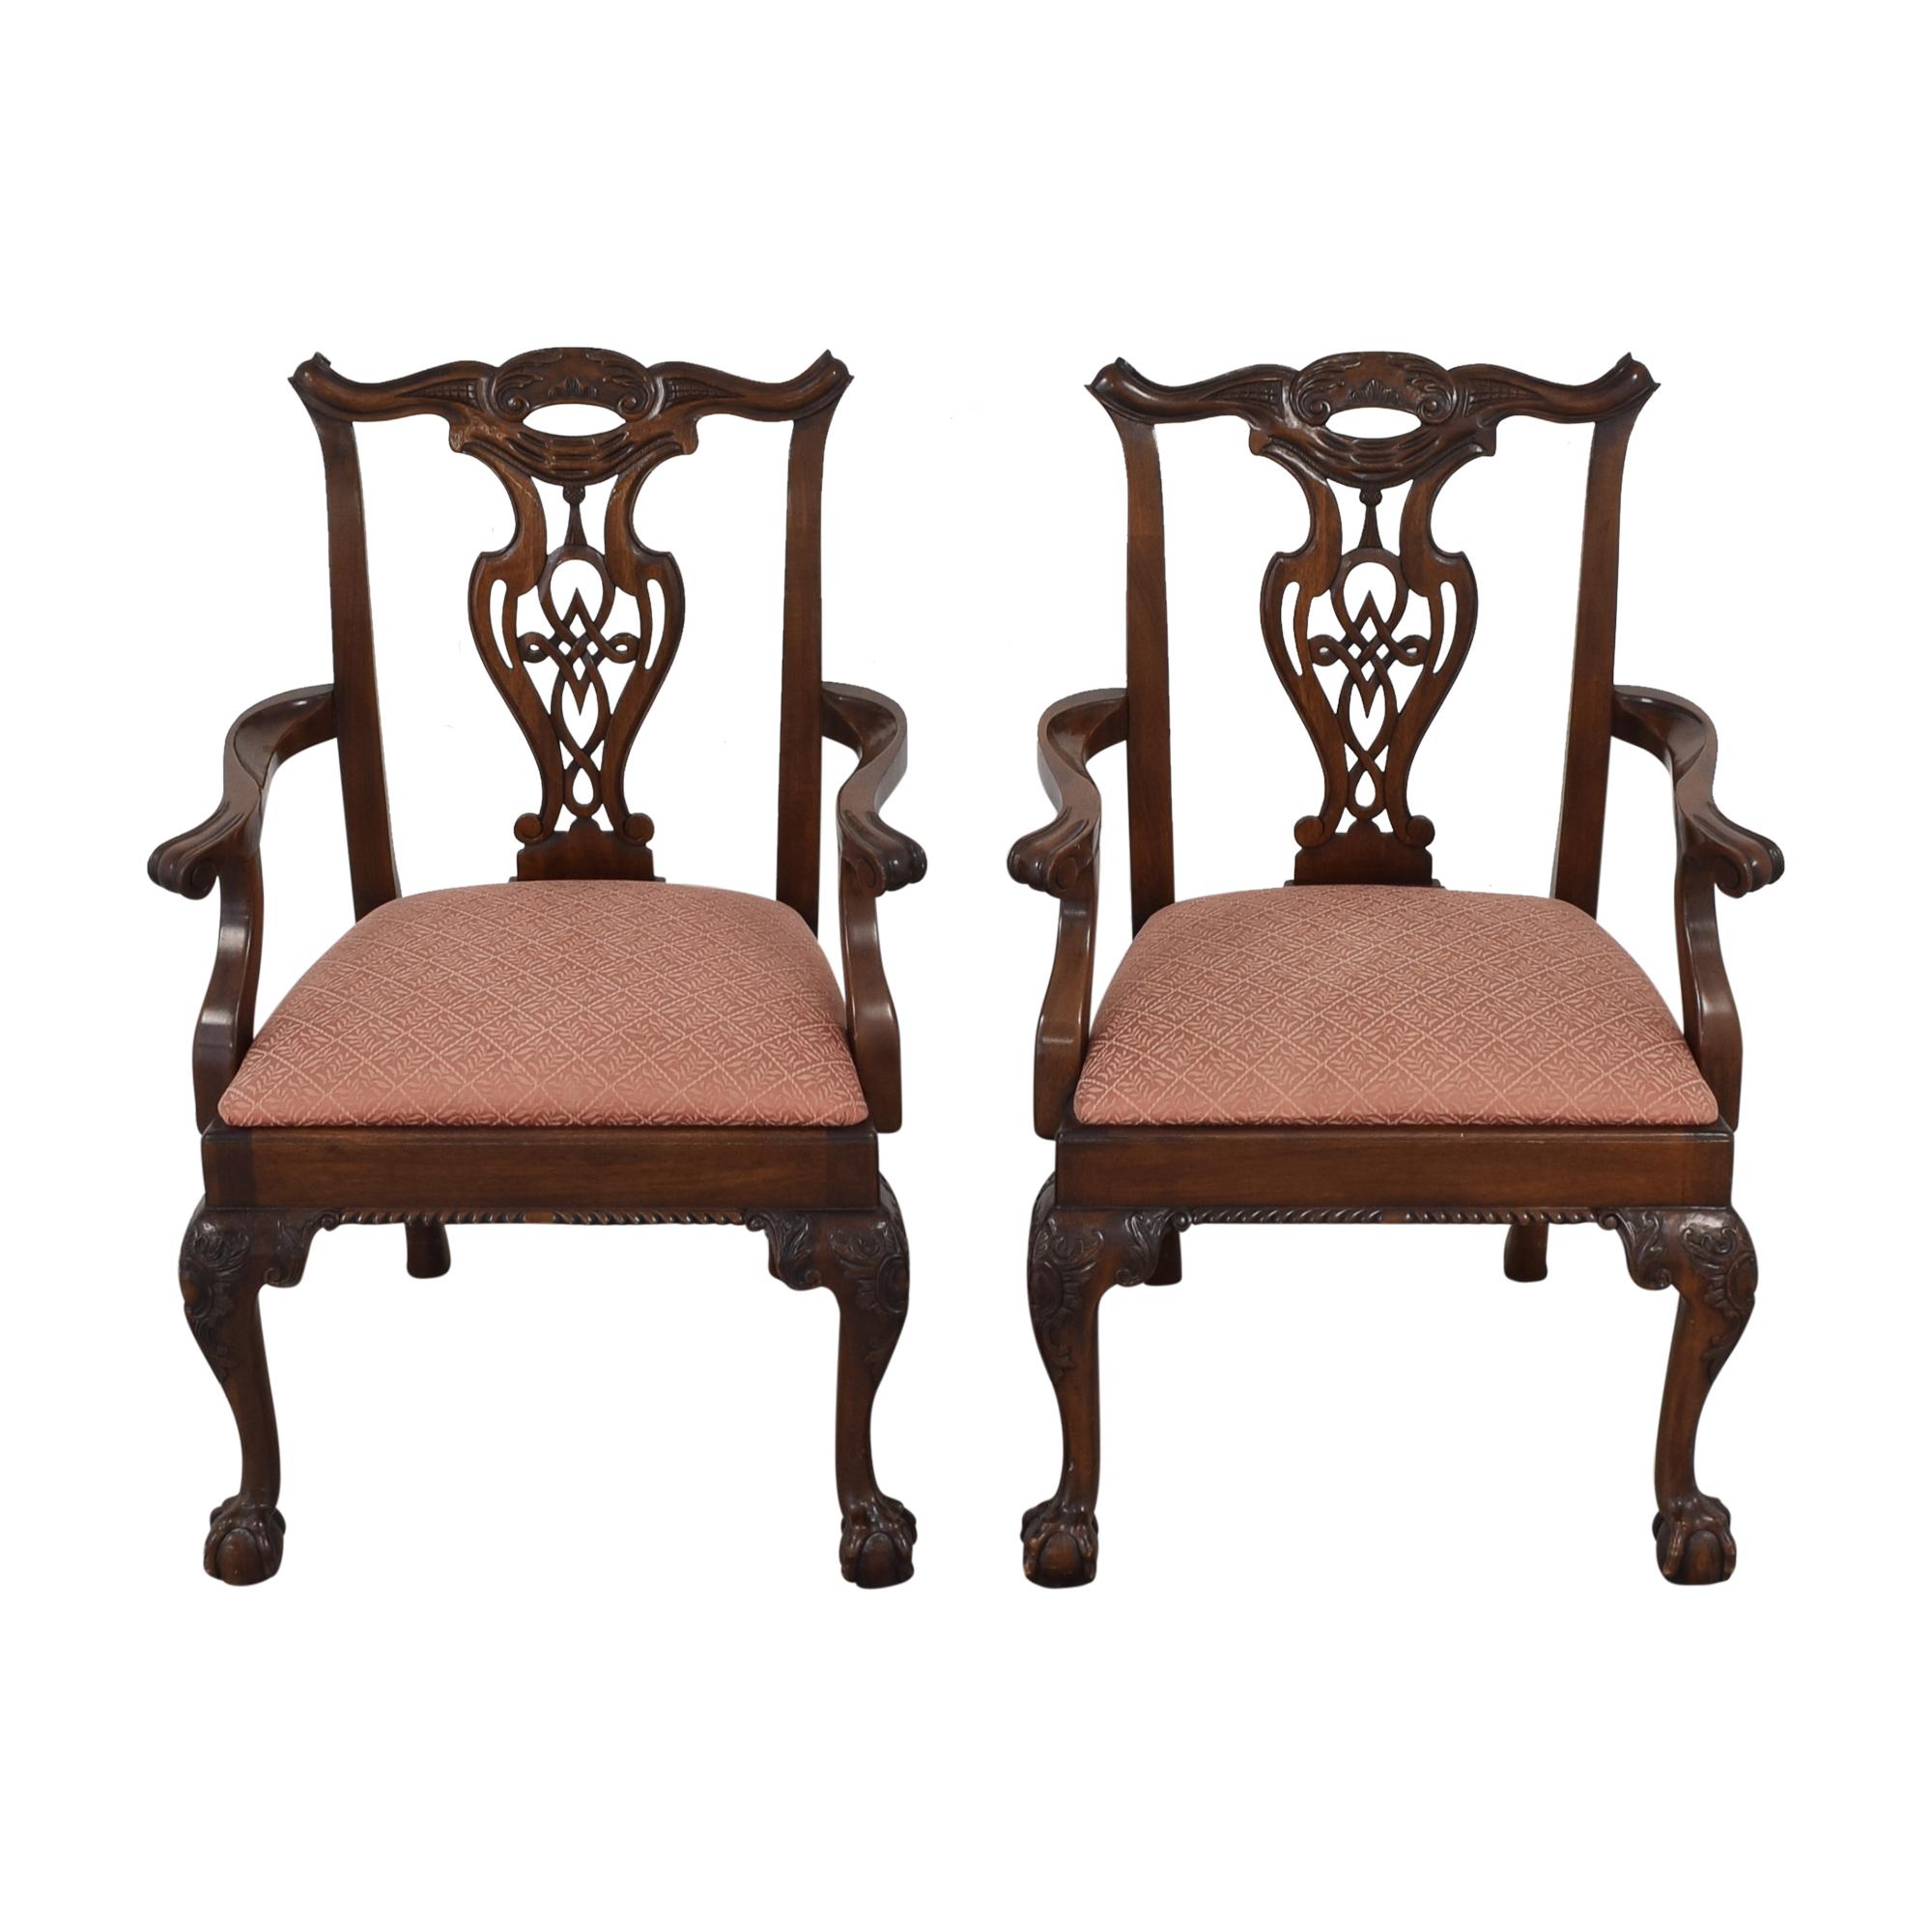 shop Henredon Heirloom Dining Chairs Henredon Furniture Chairs